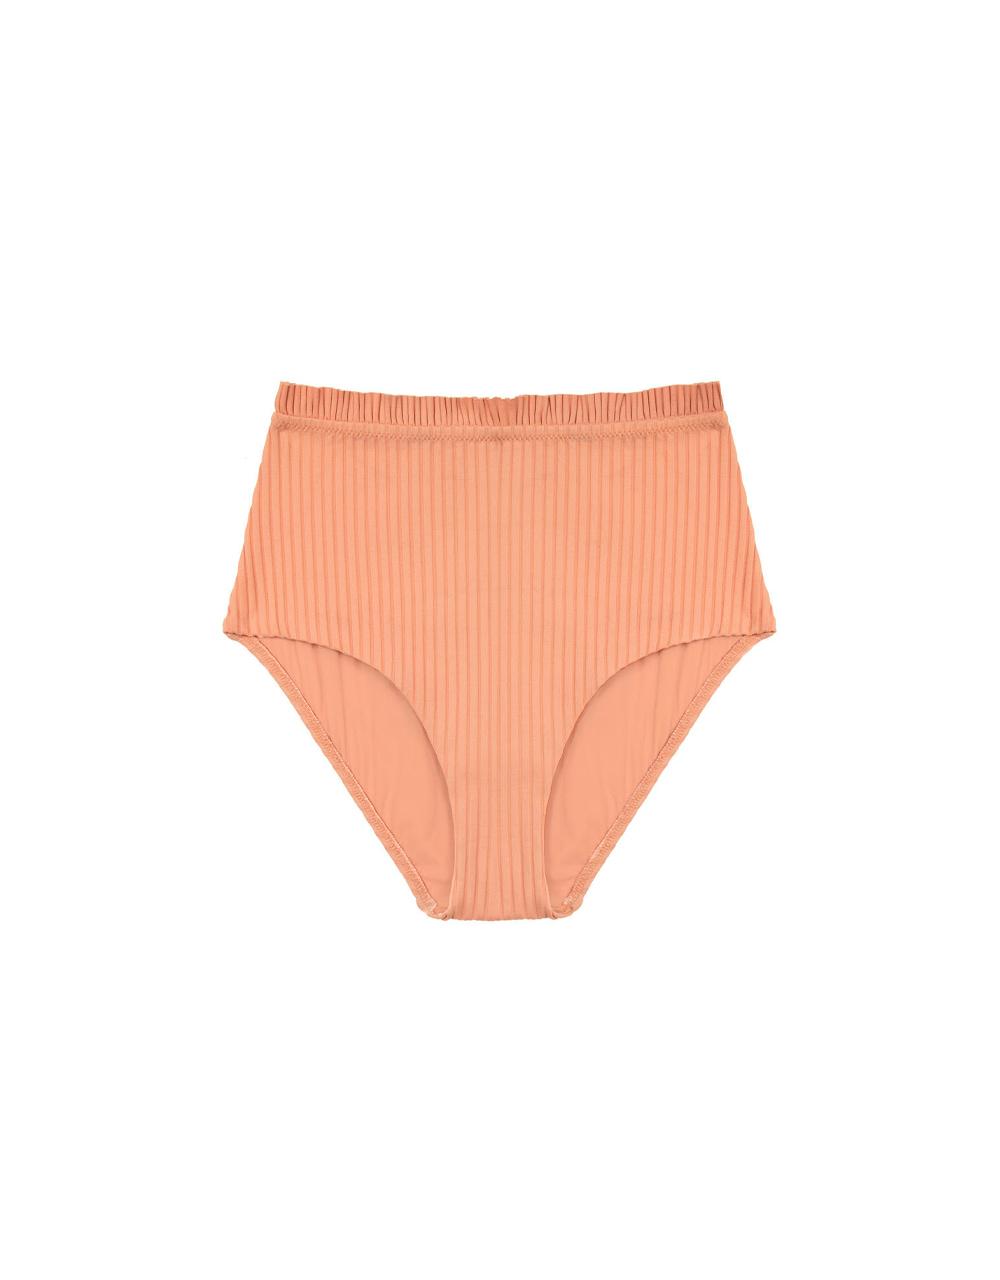 swimsuit hight waist bikini bottom South Apricot 30 € Girls In Paris photo 6